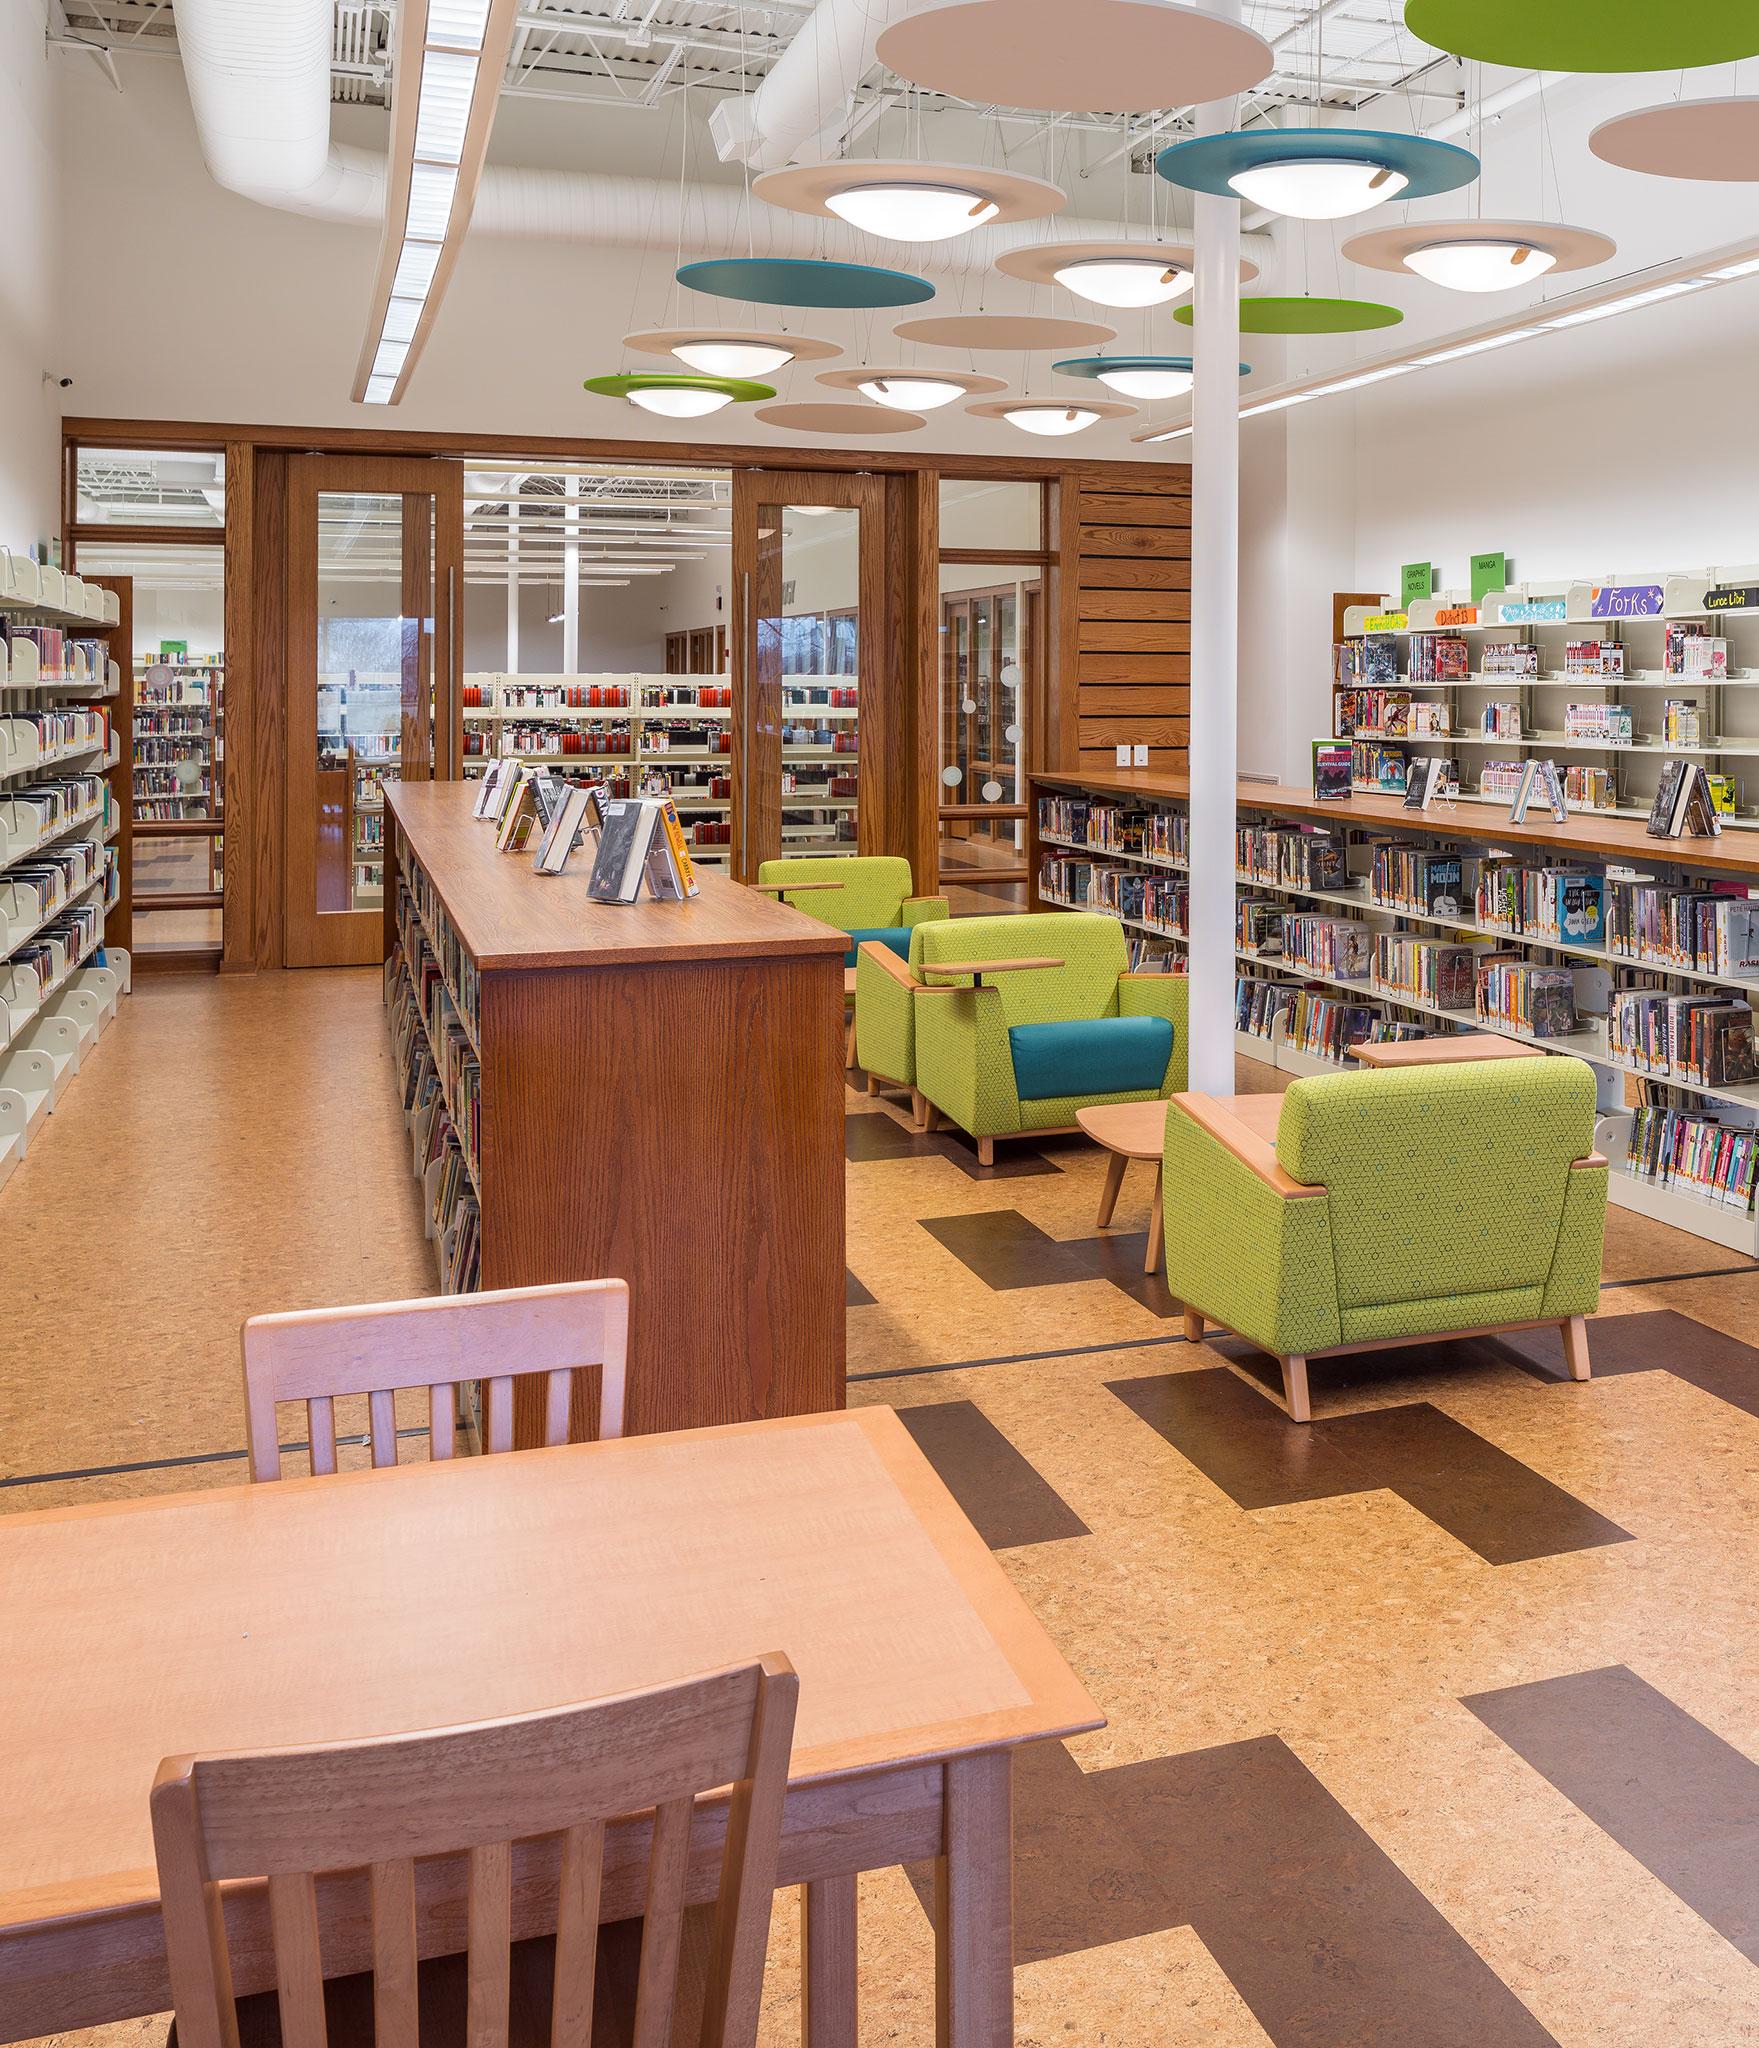 Cabot_library05_Sela_library_corbett_norristown_experience-center.jpg